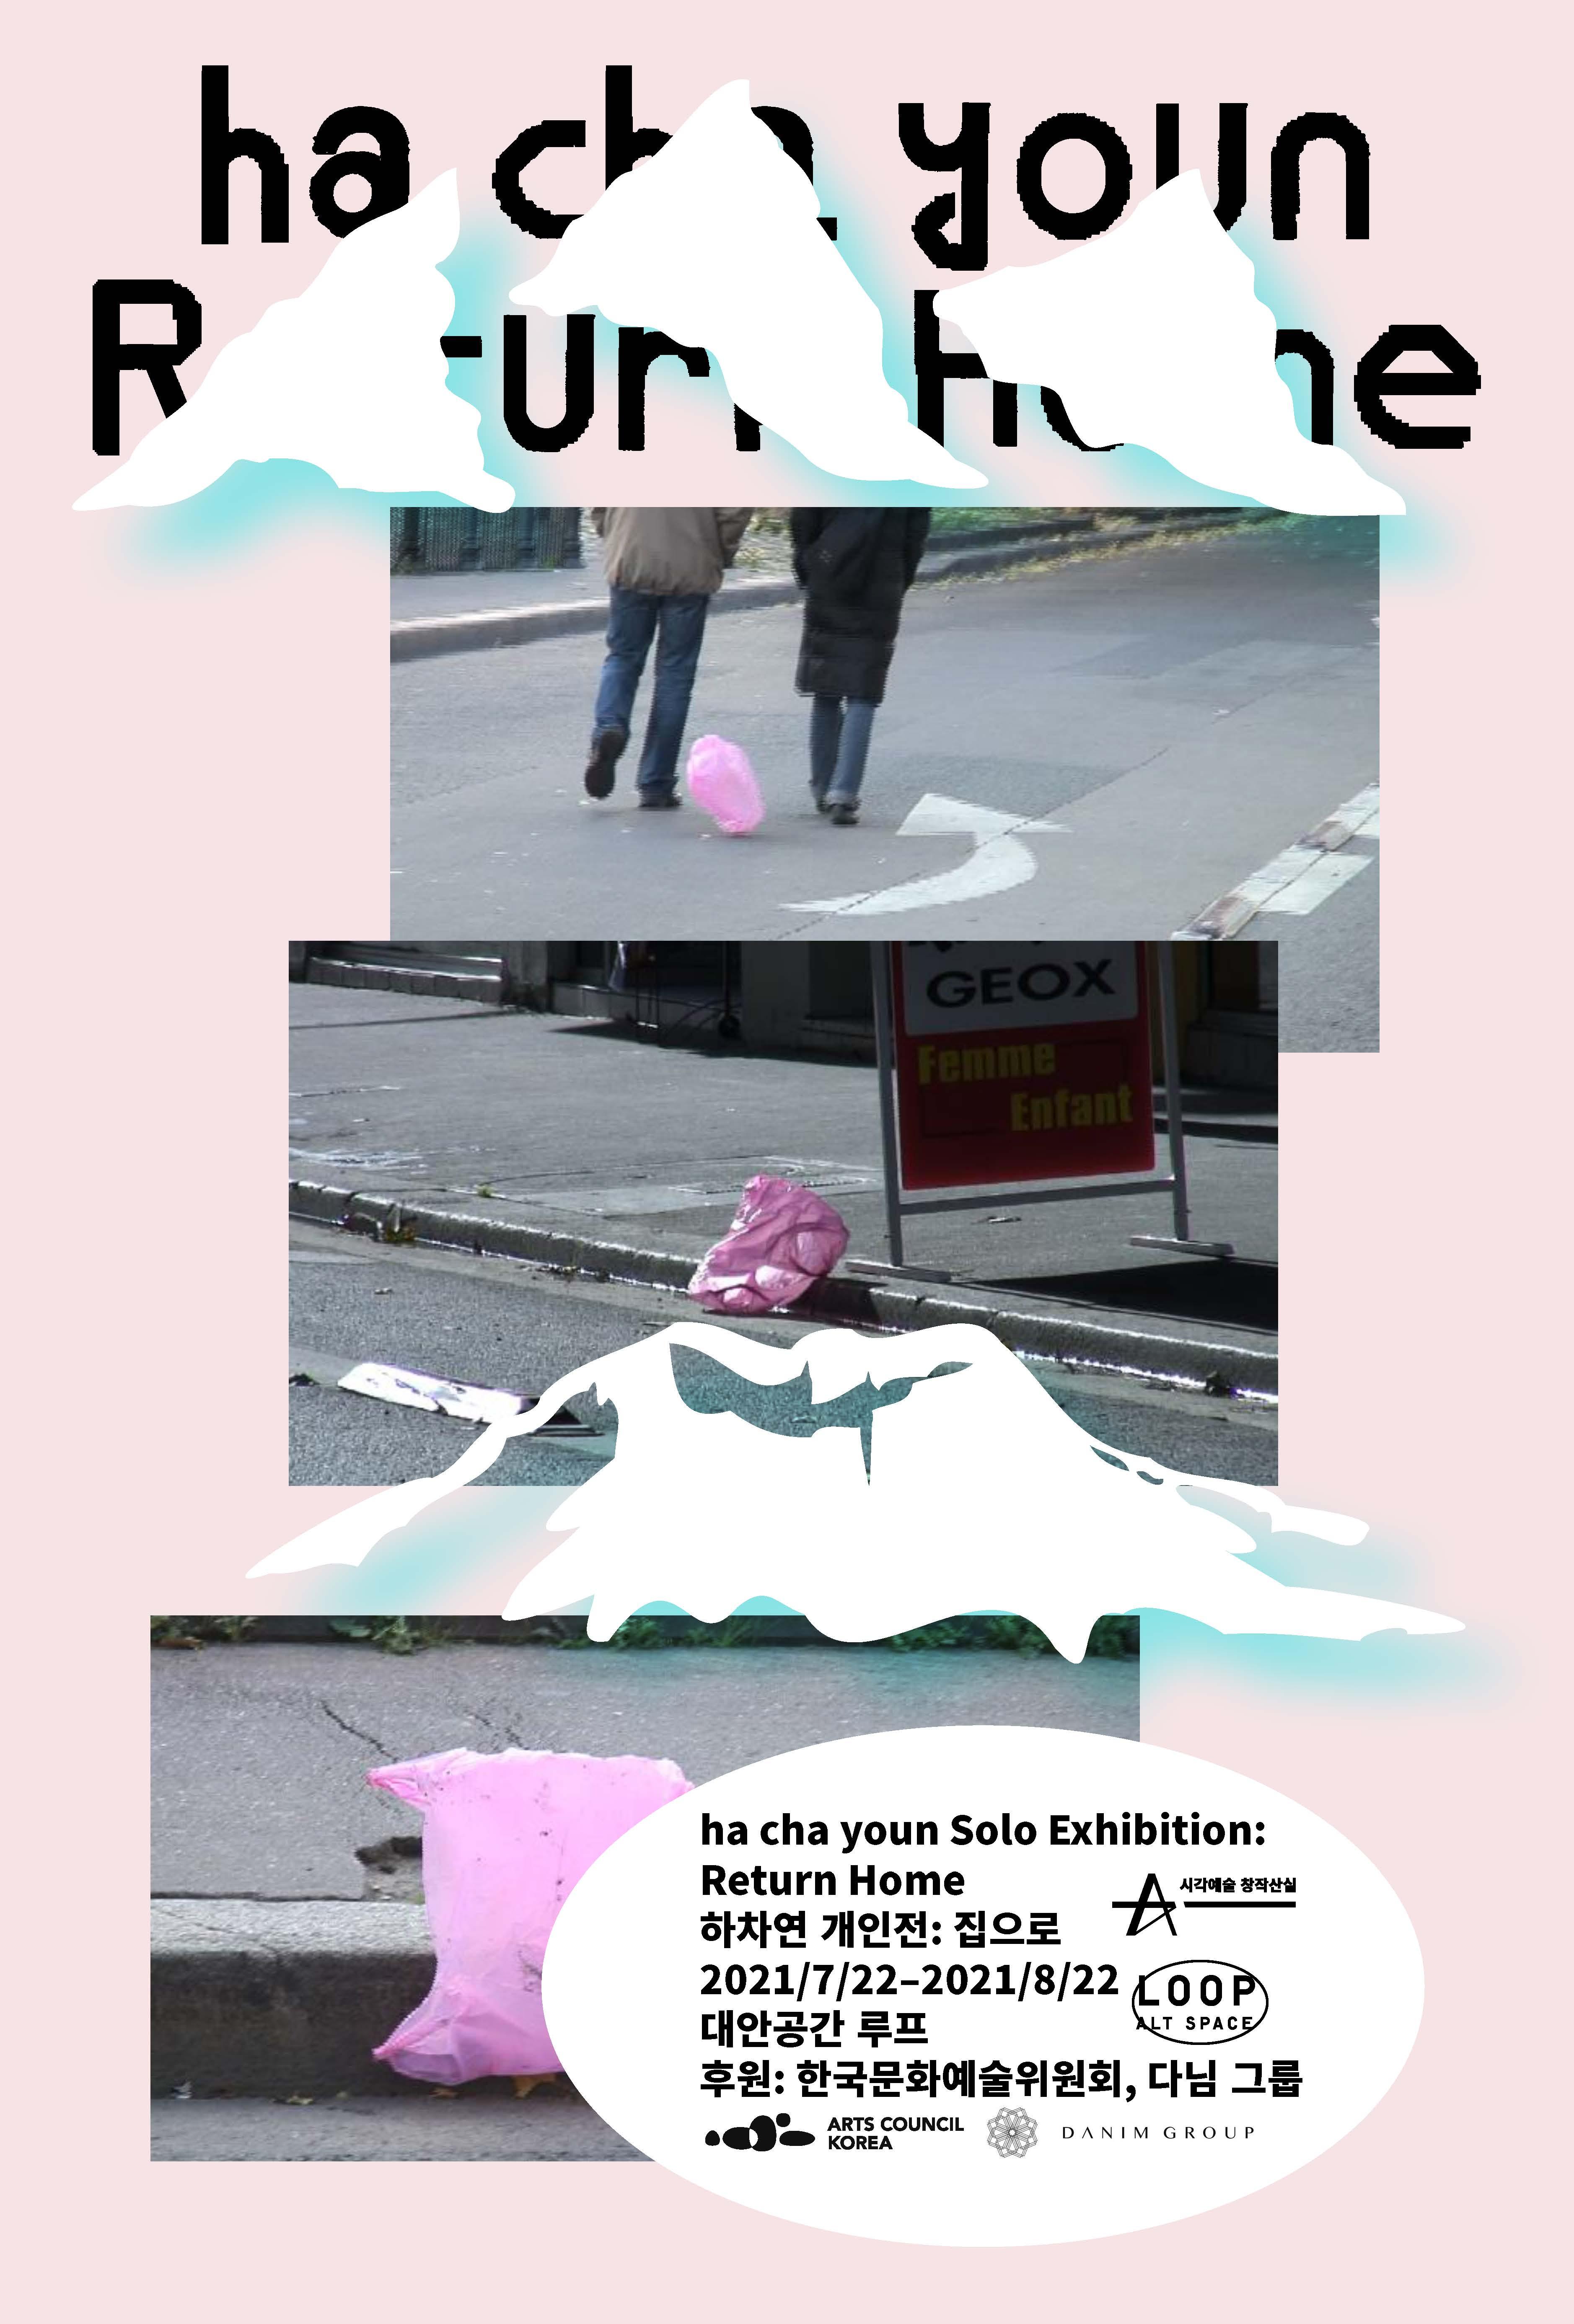 ha cha youn Solo Exhibition: Return Home